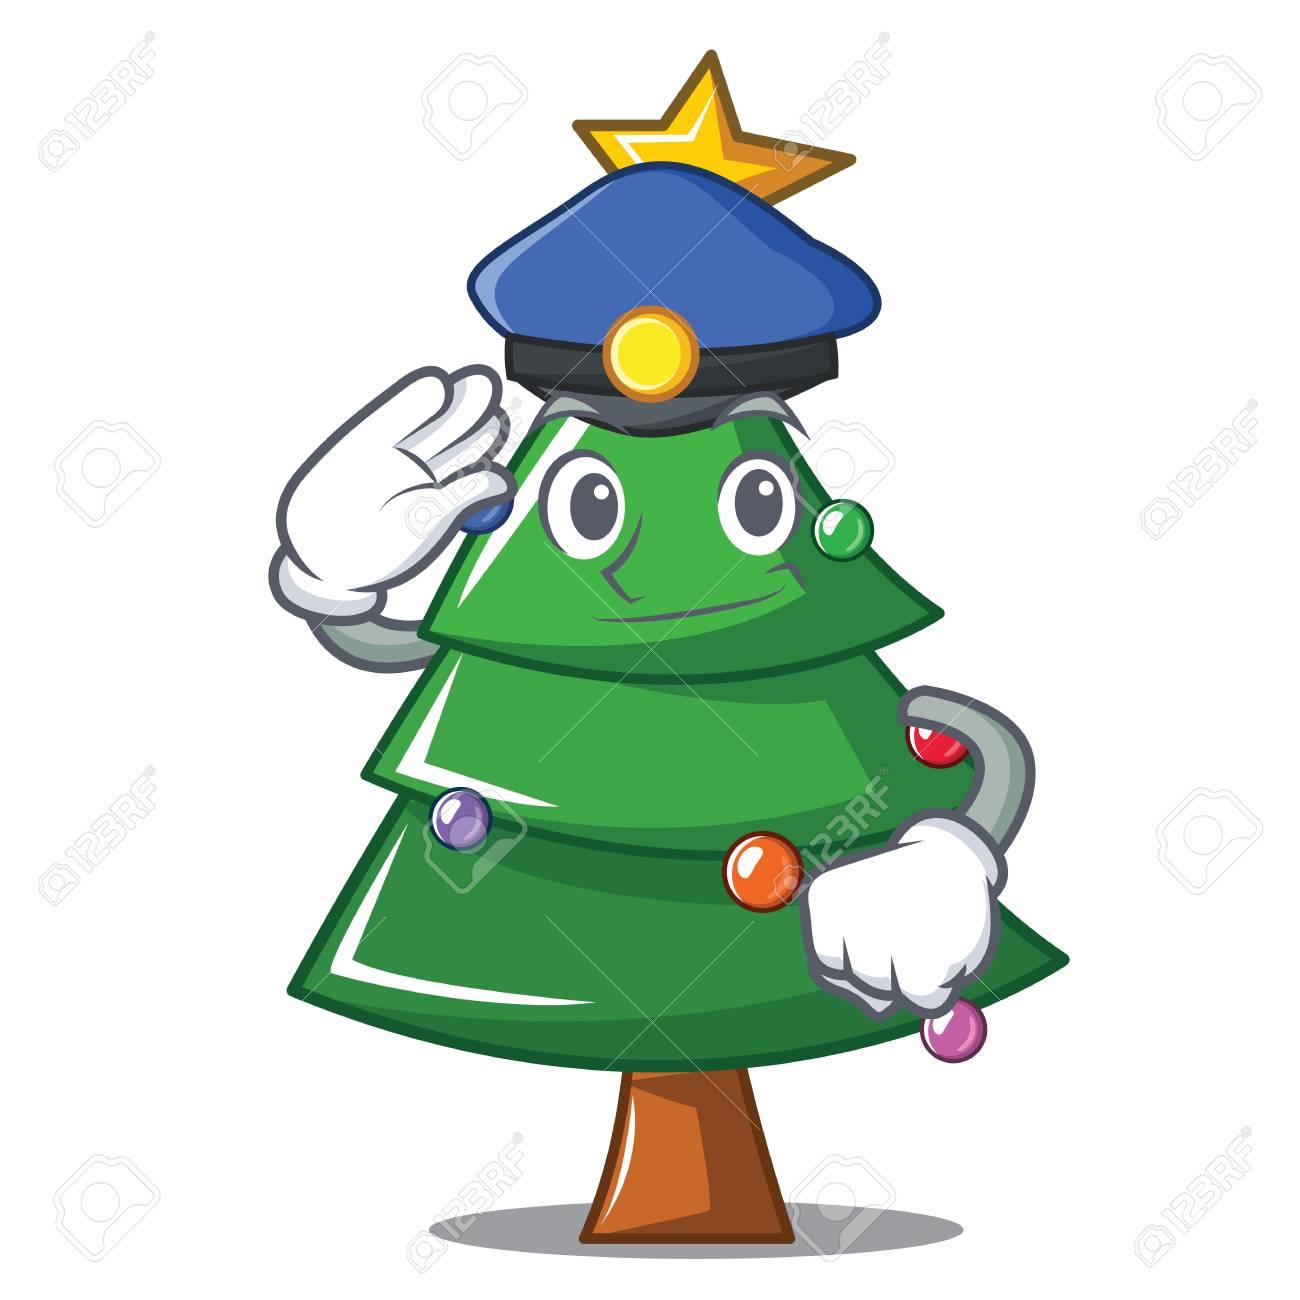 Christmas Images Free Cartoon.Police Christmas Tree Character Cartoon Vector Illustration